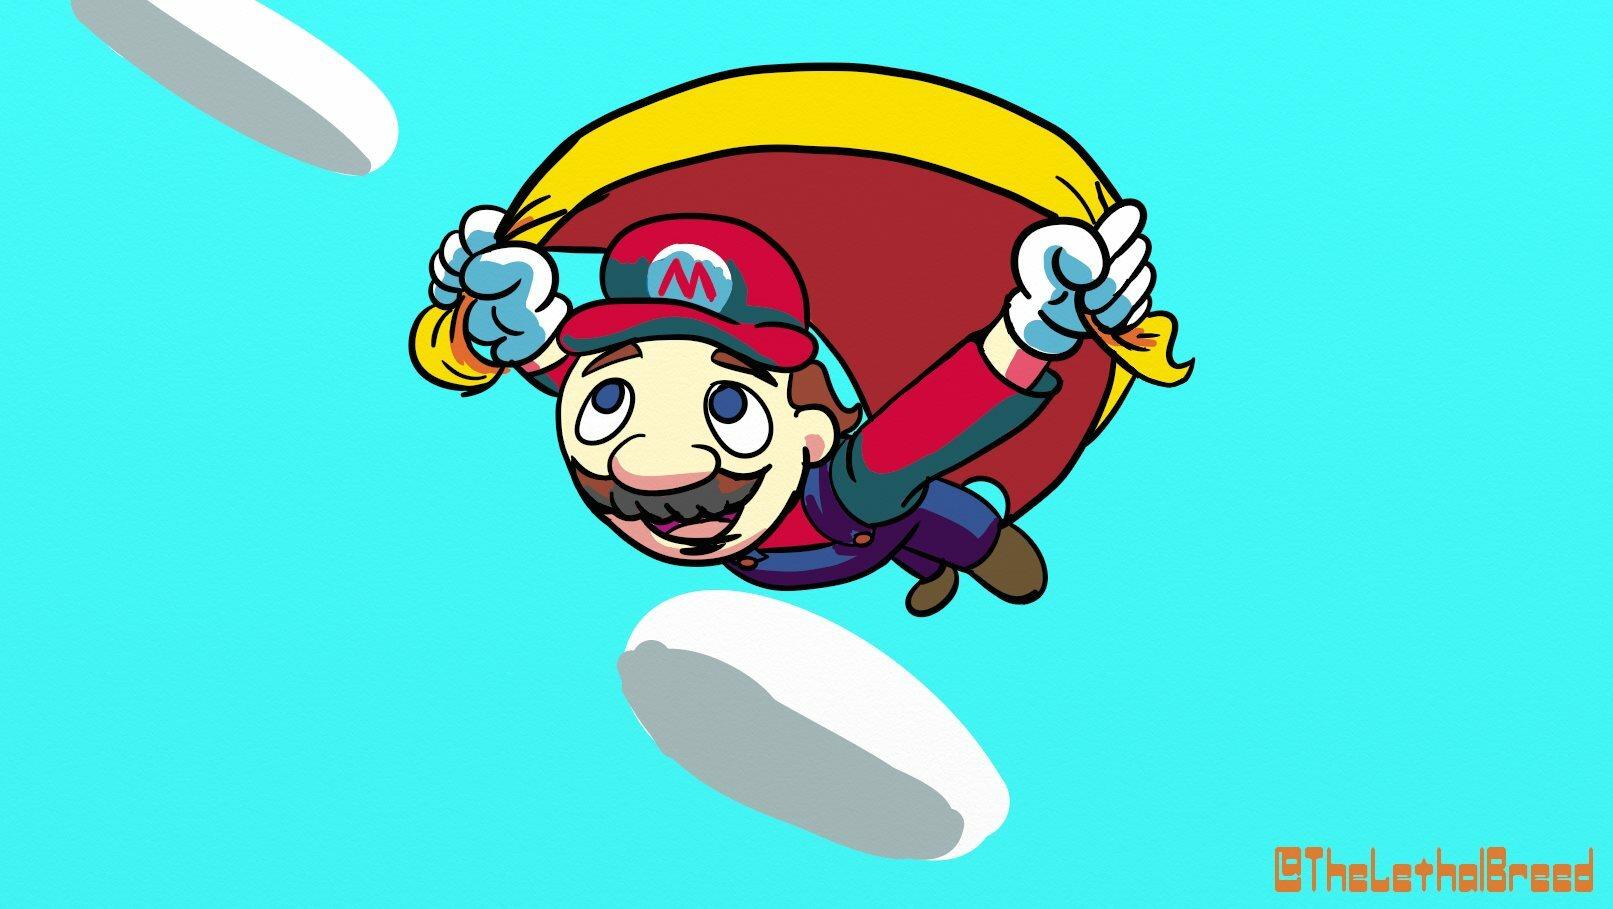 Mario for Mar10